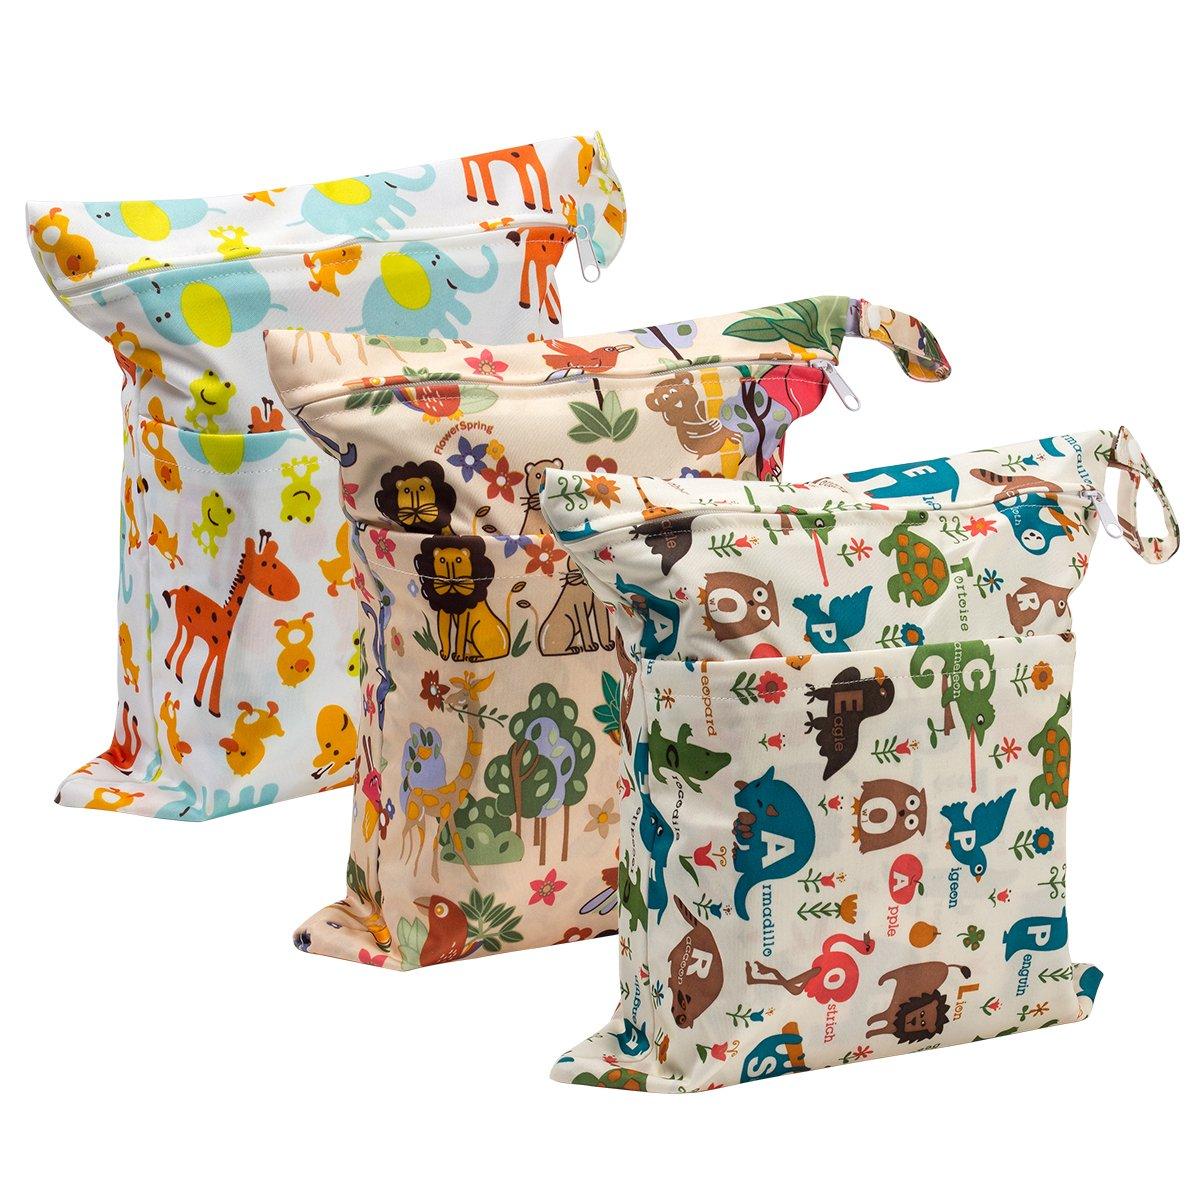 Biubee 3 Pack Wet Dry Cloth Diaper Bags - Baby Waterproof Washable Reusable Hanging Diaper Organizer by Biubee